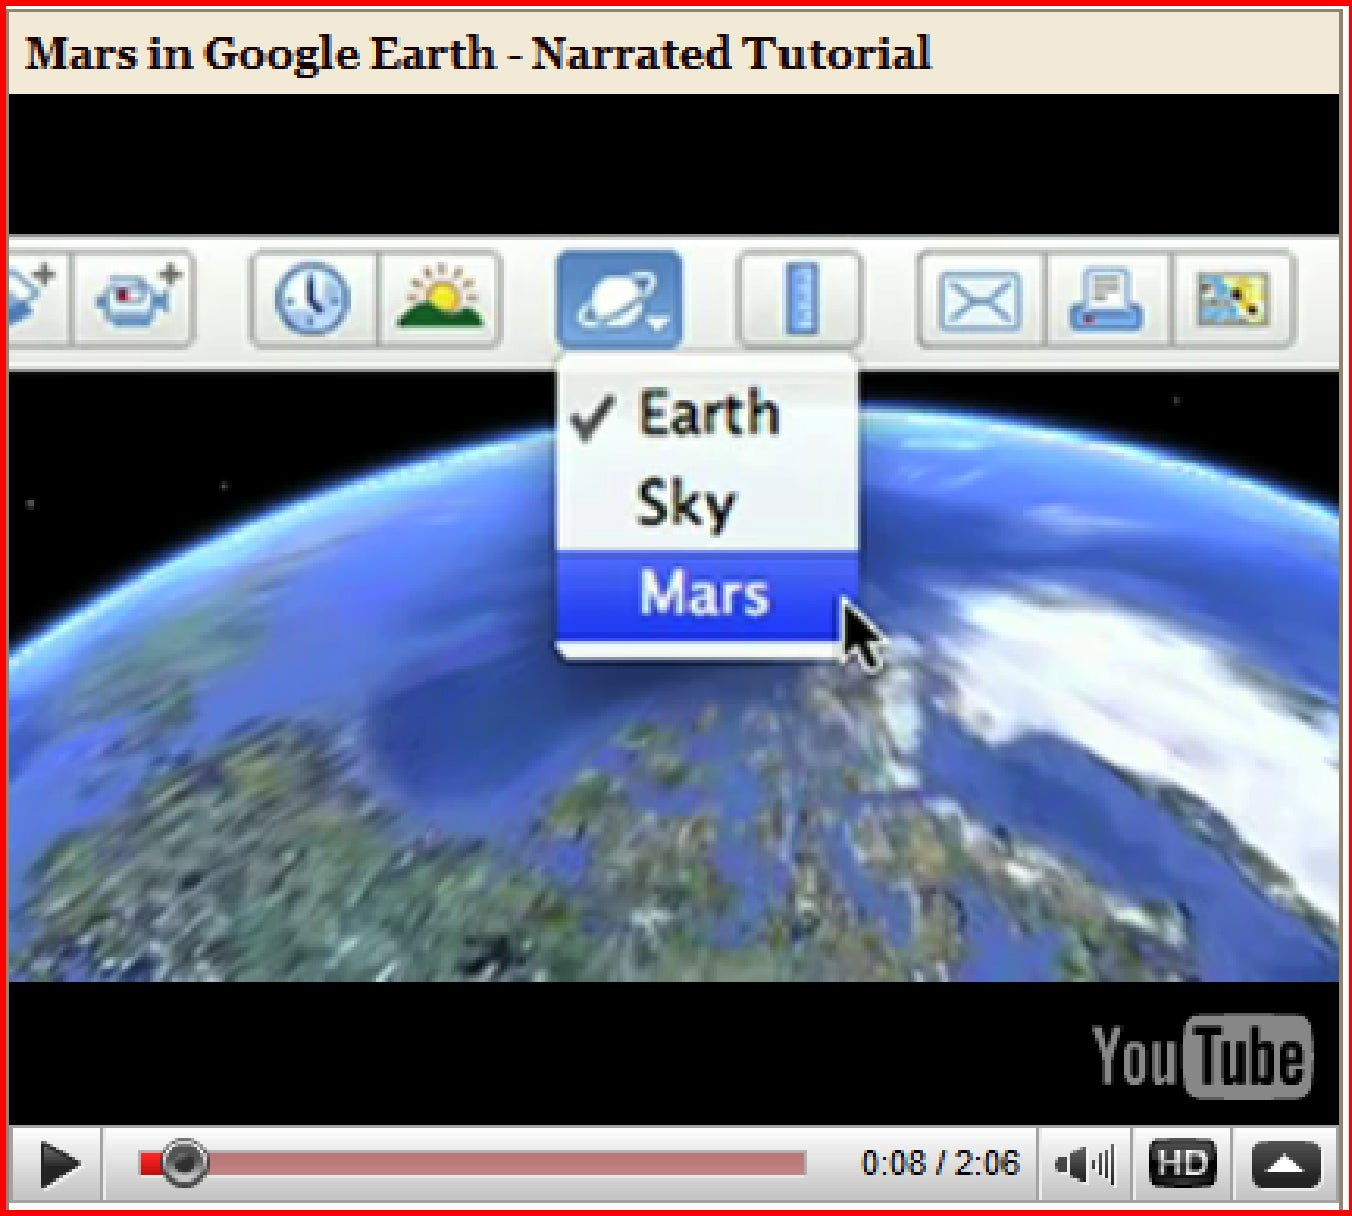 Go to google earth